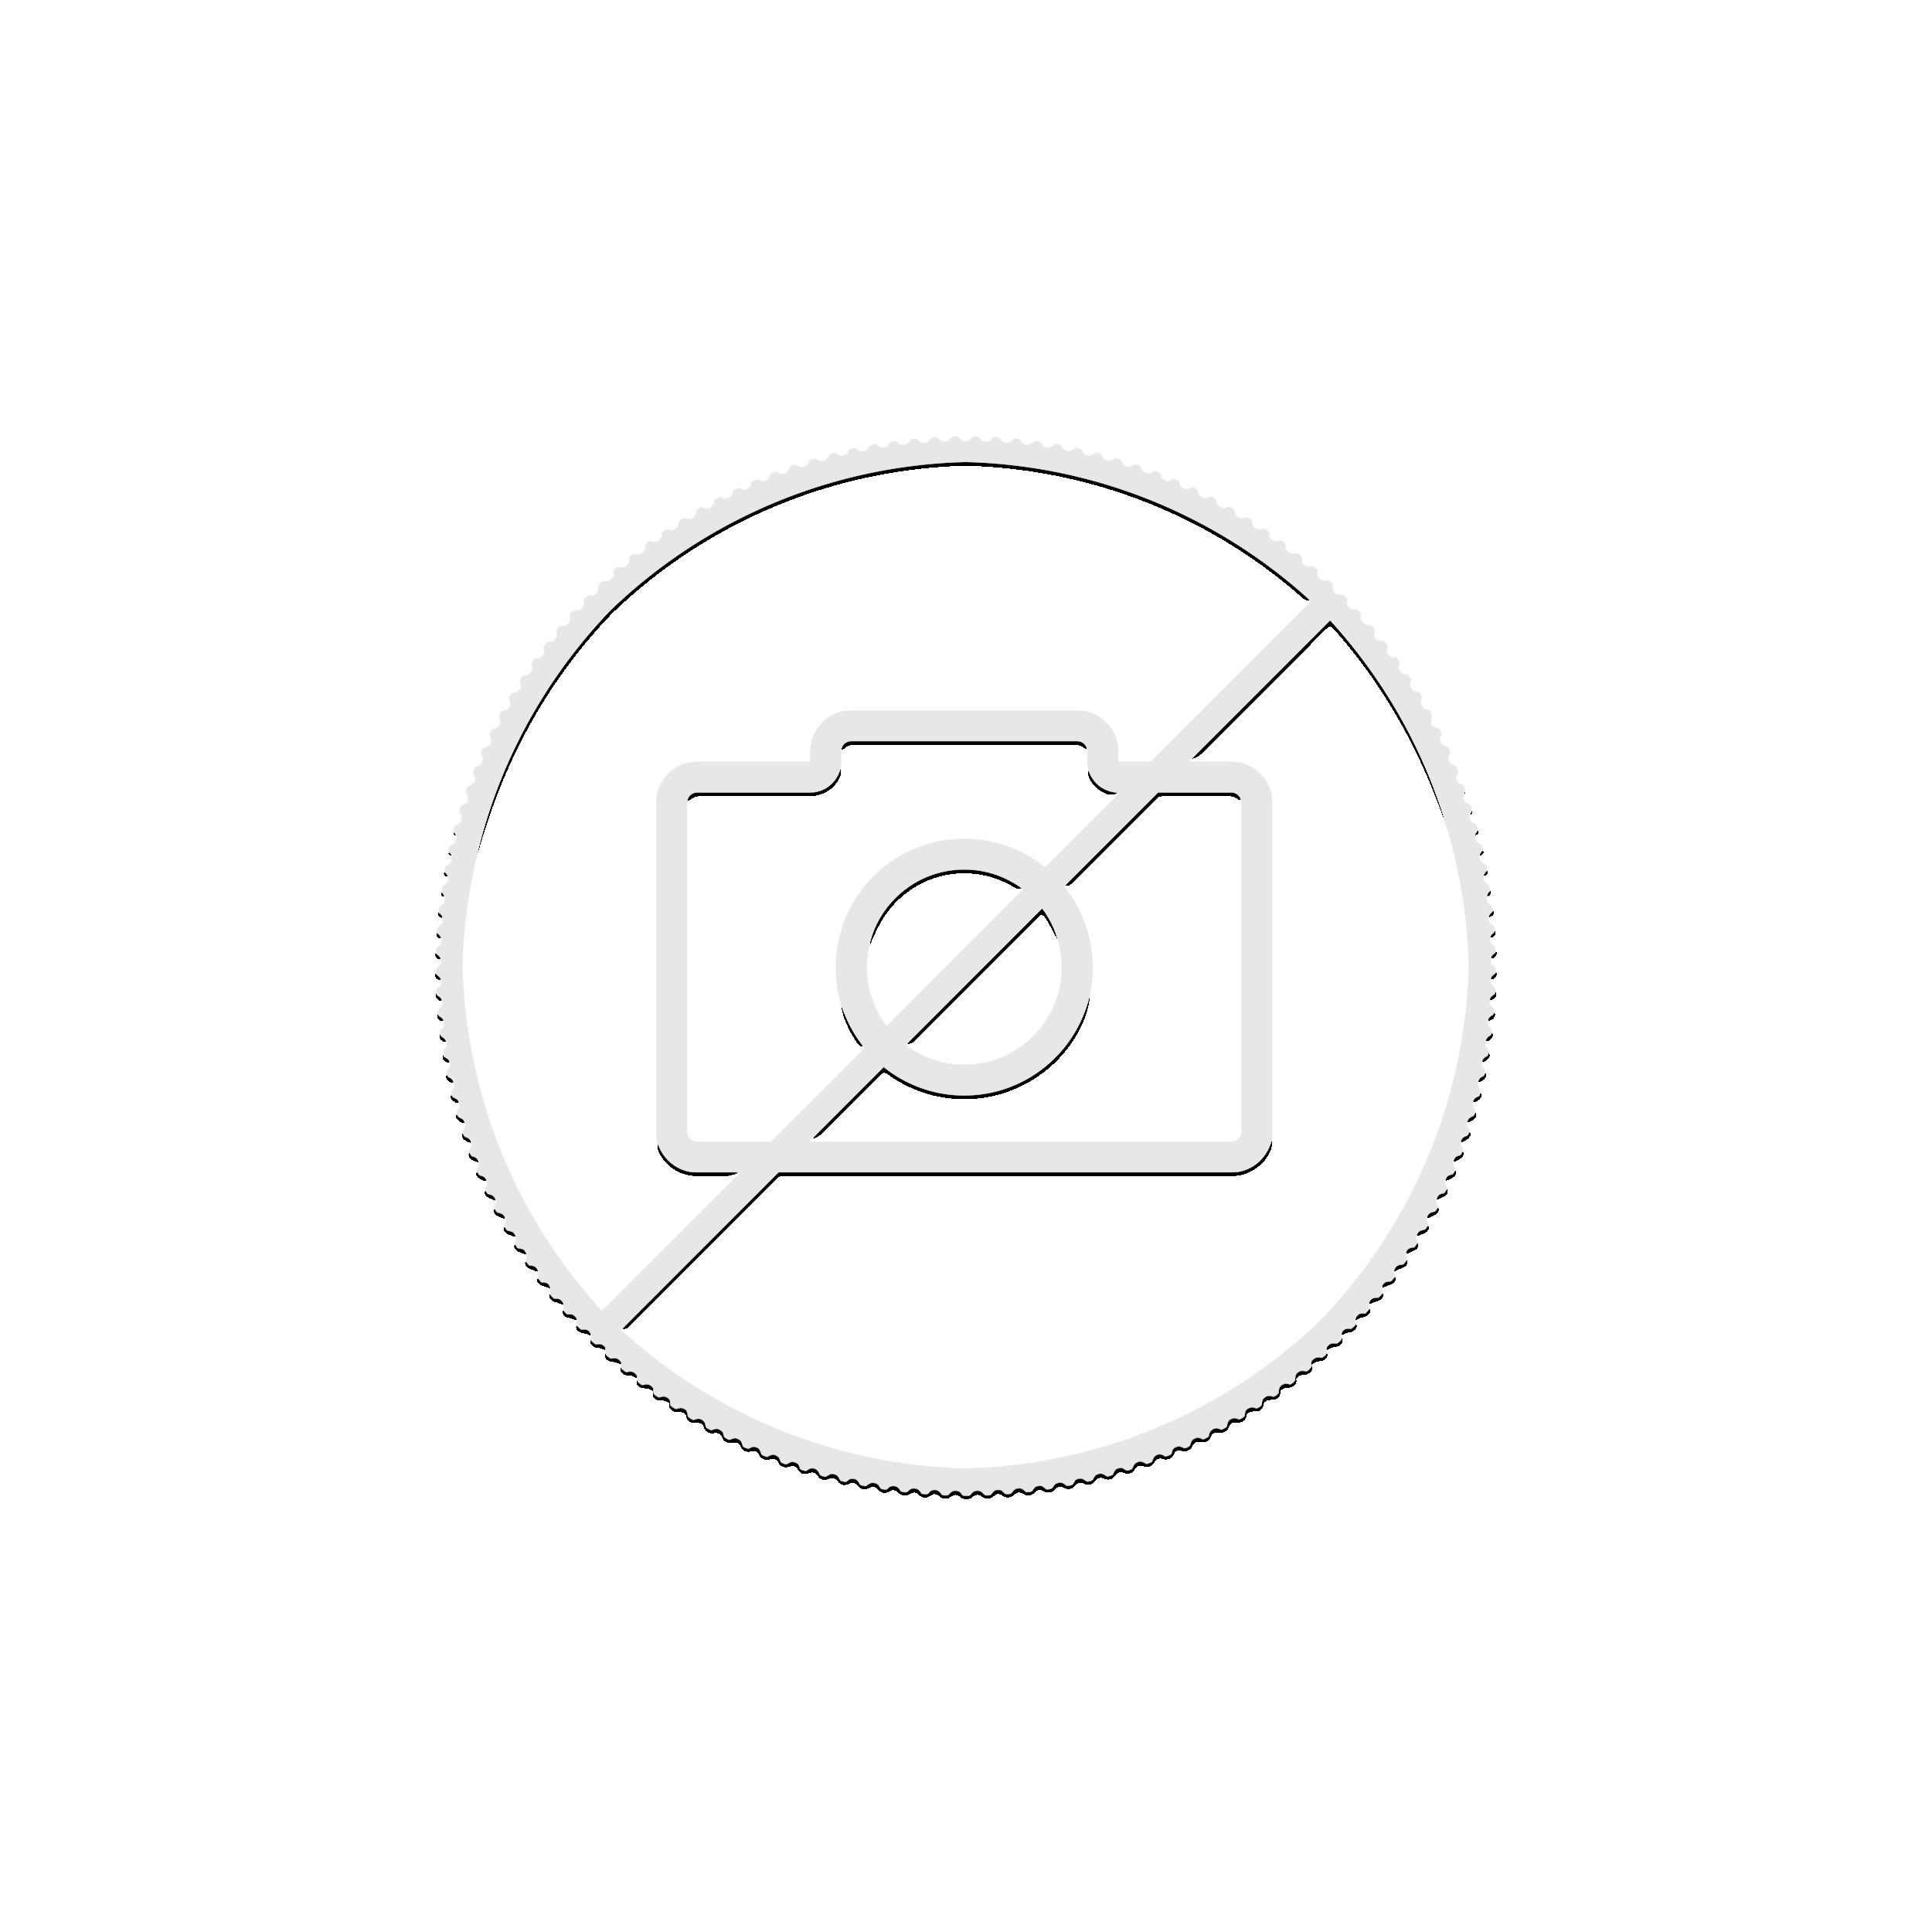 2 troy ounce silver coin Gustav Klimt 2020